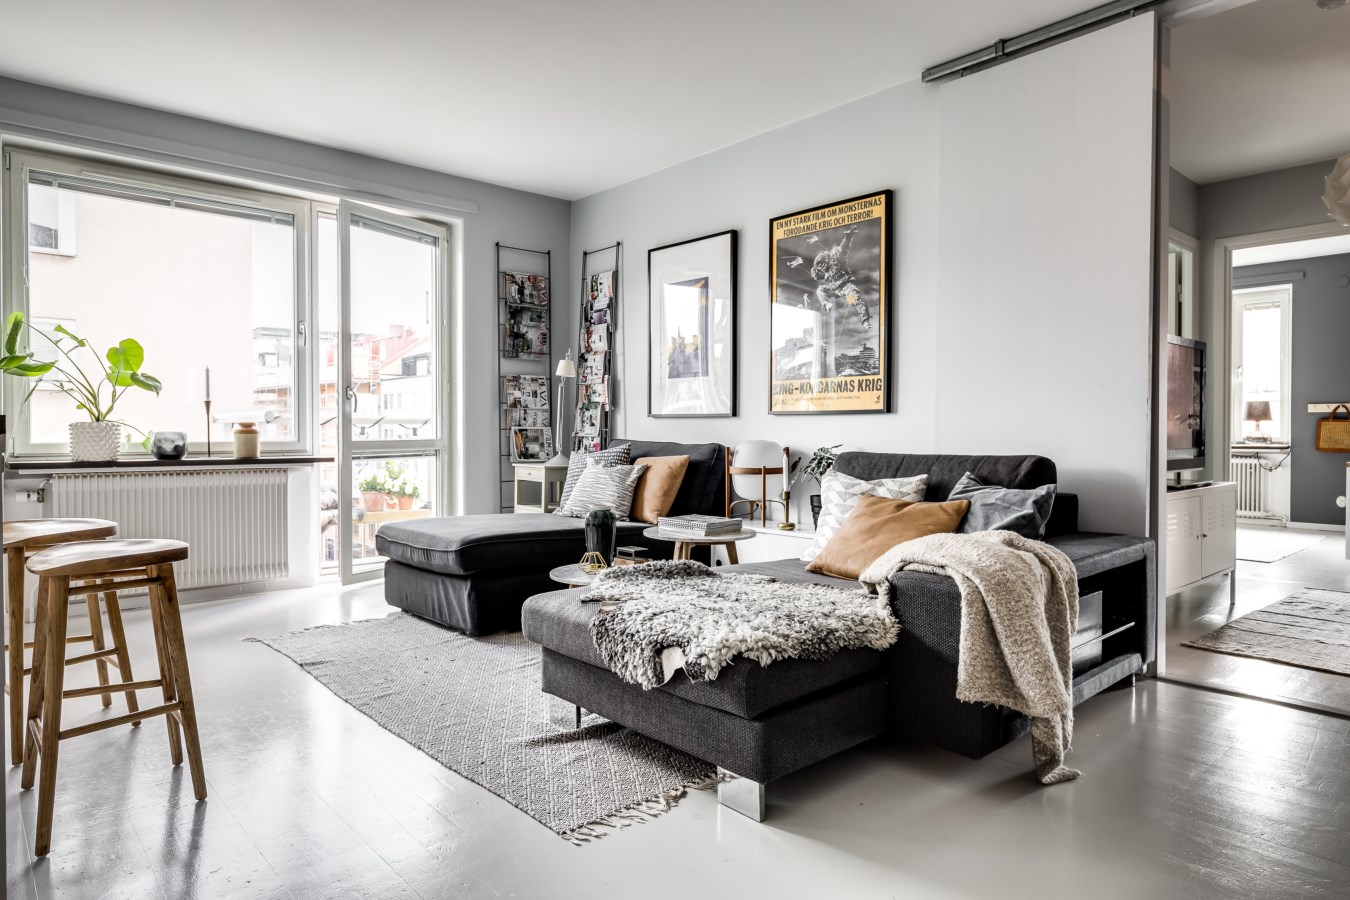 гостиная диван подушки ковер